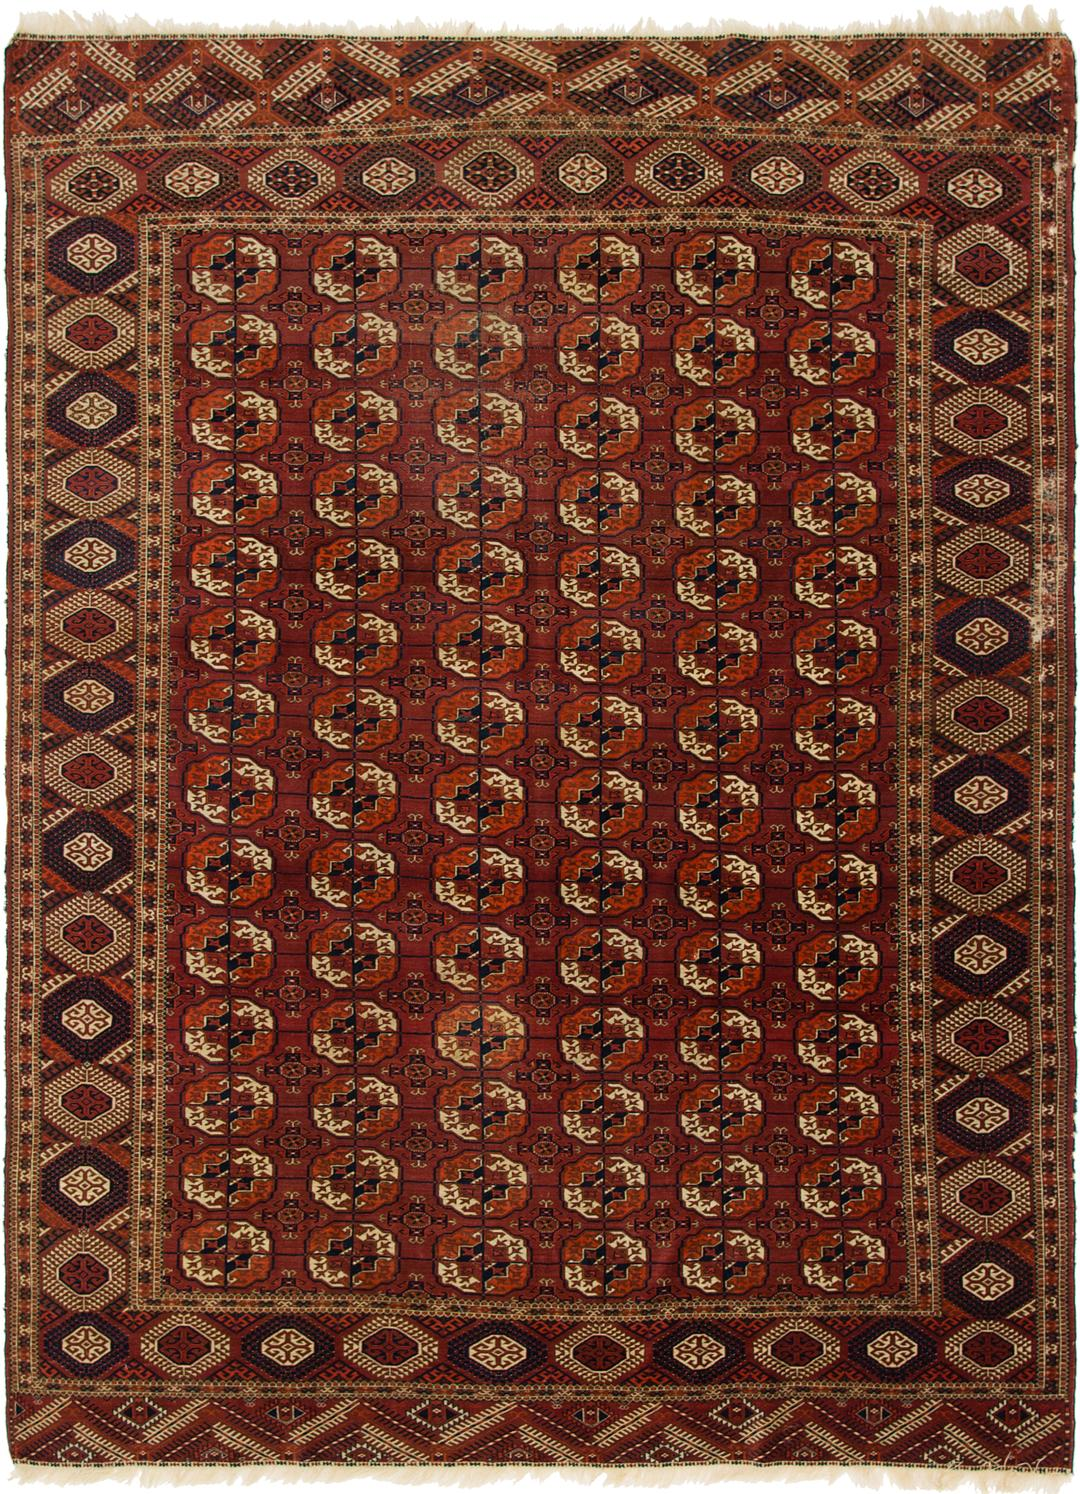 Main Unique Loom 7 3 X 9 Bokhara Oriental Rug Photo